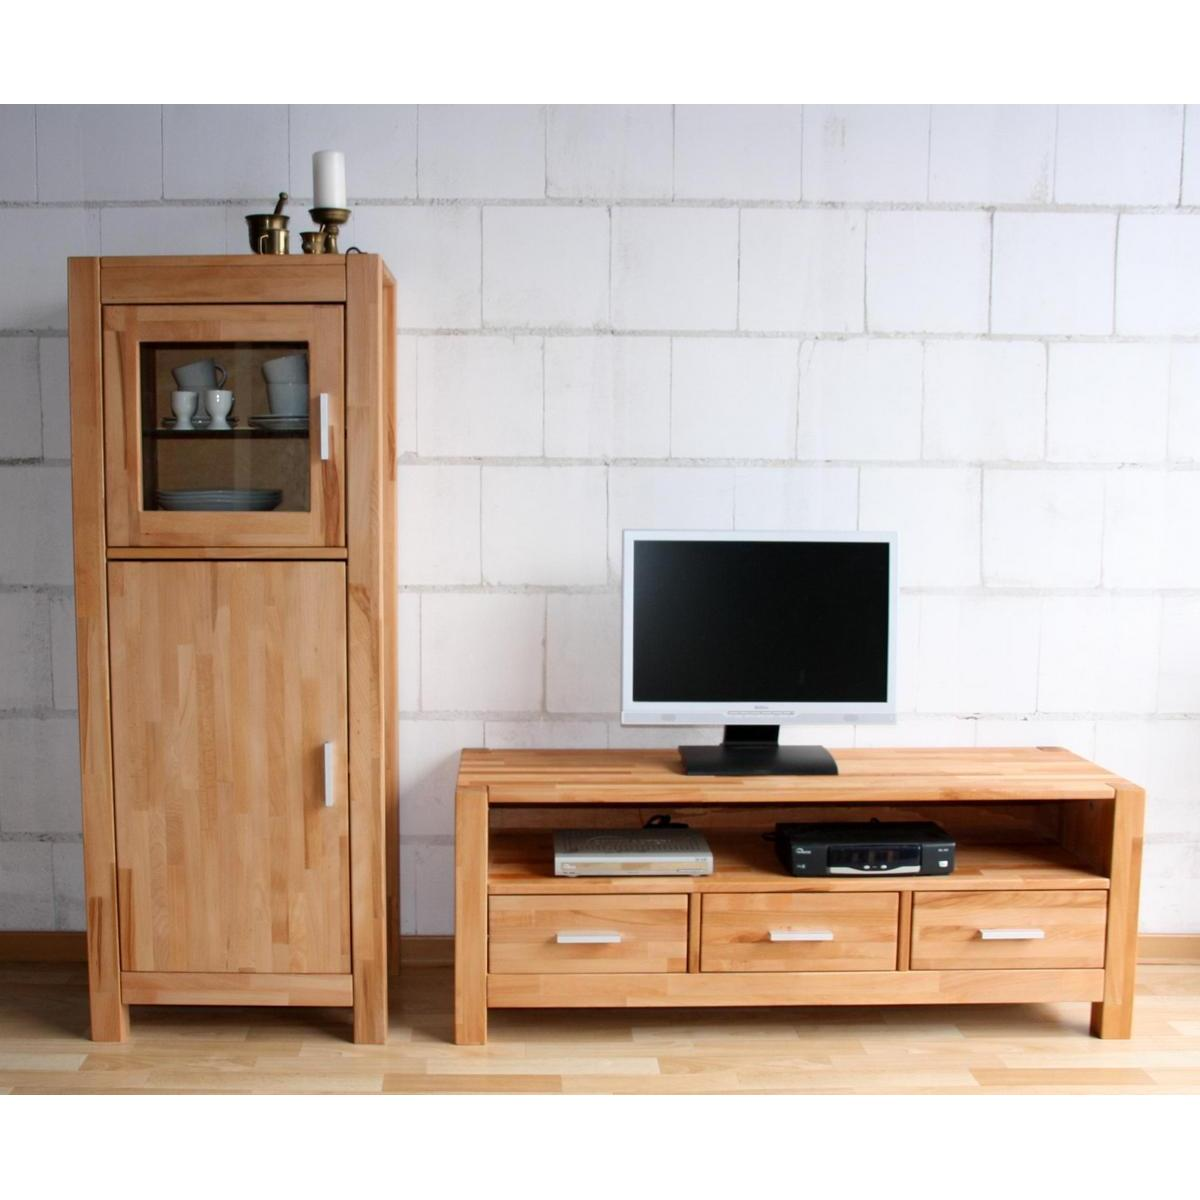 massivholz wohnwand buche massiv ge lt anbauwand max. Black Bedroom Furniture Sets. Home Design Ideas